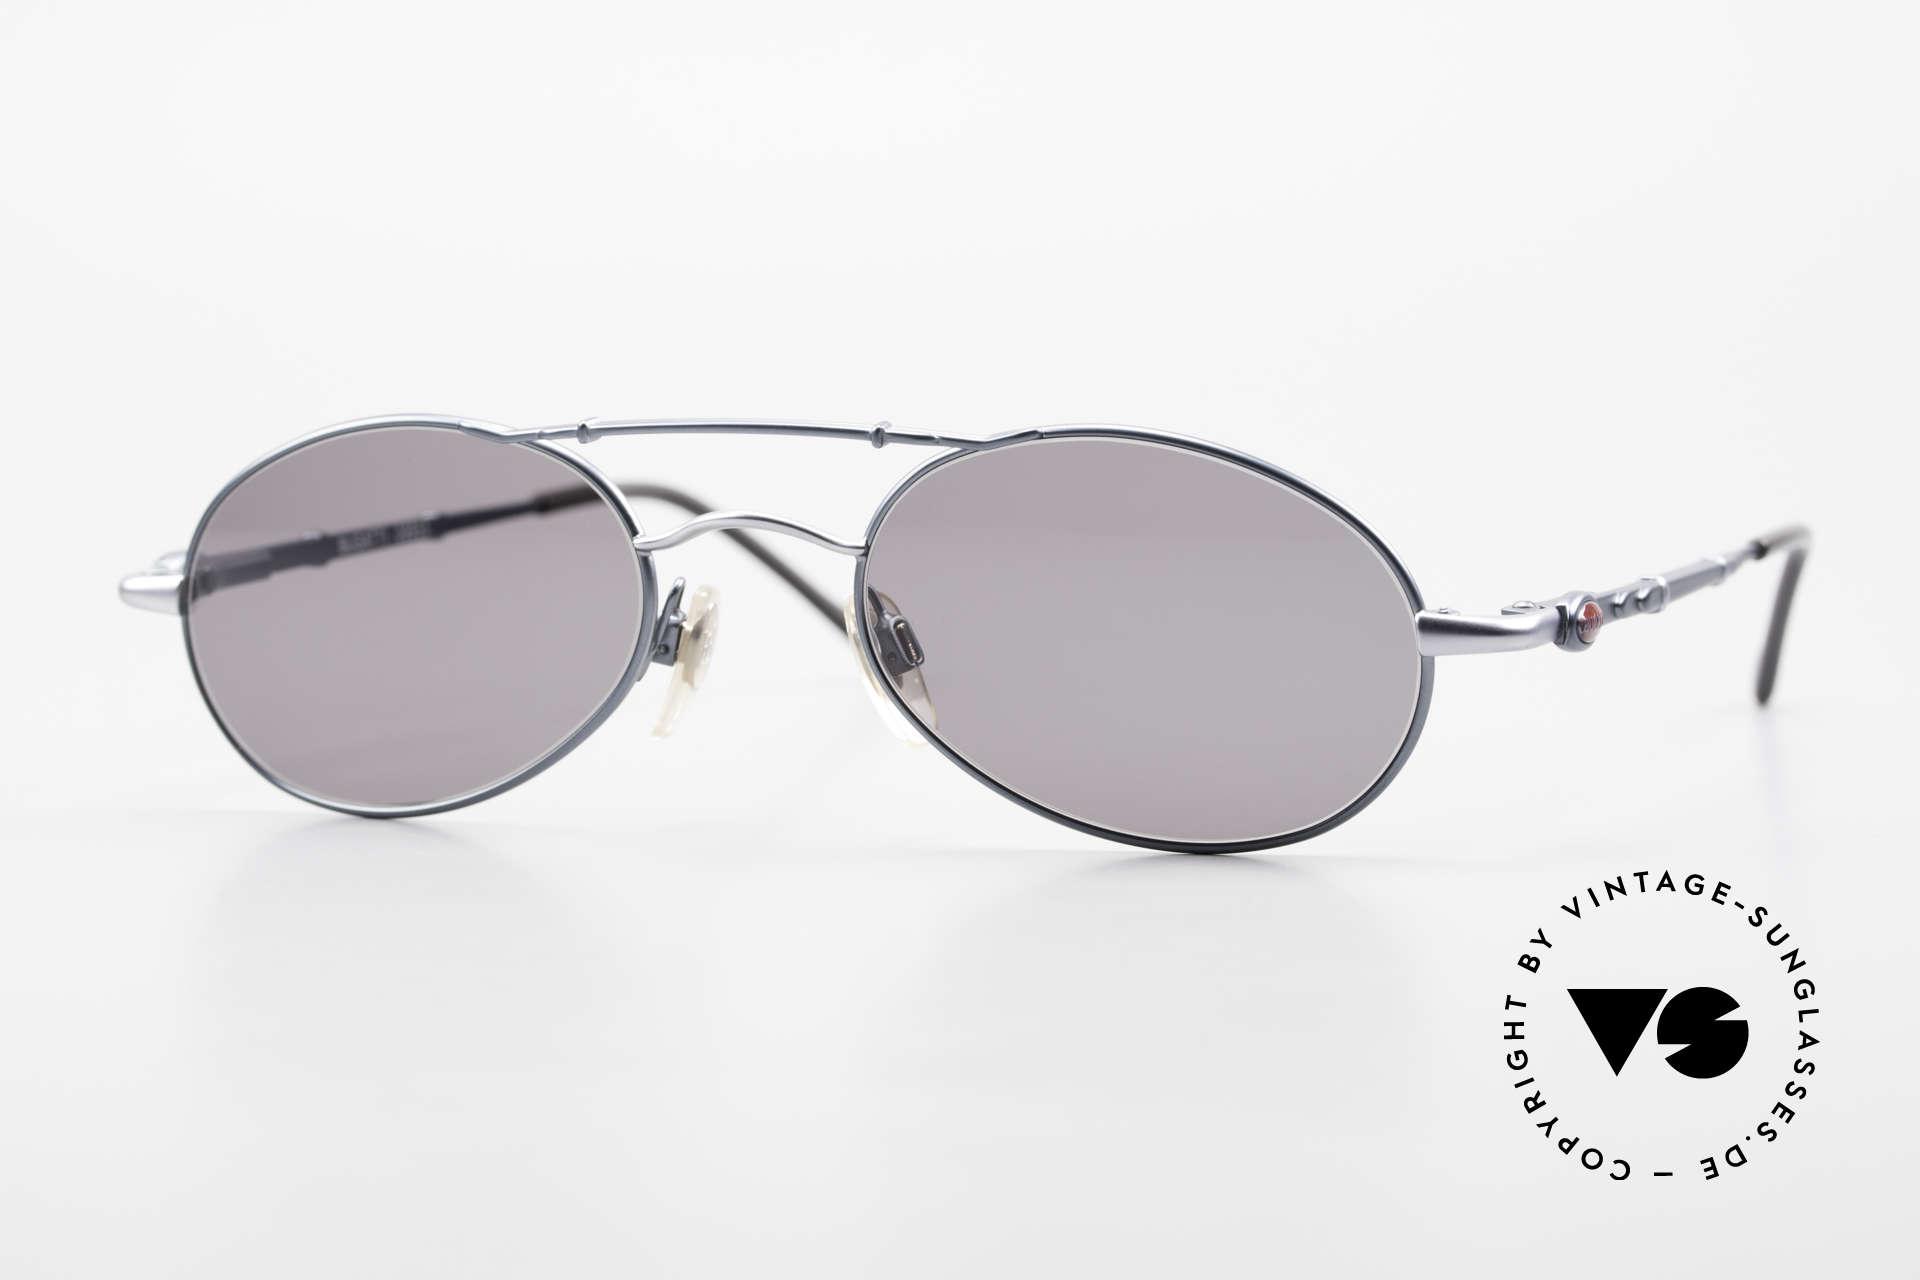 Bugatti 09953 Leaf Spring Temples and Bridge, classic Bugatti sunglasses from app. 1995/96, Made for Men